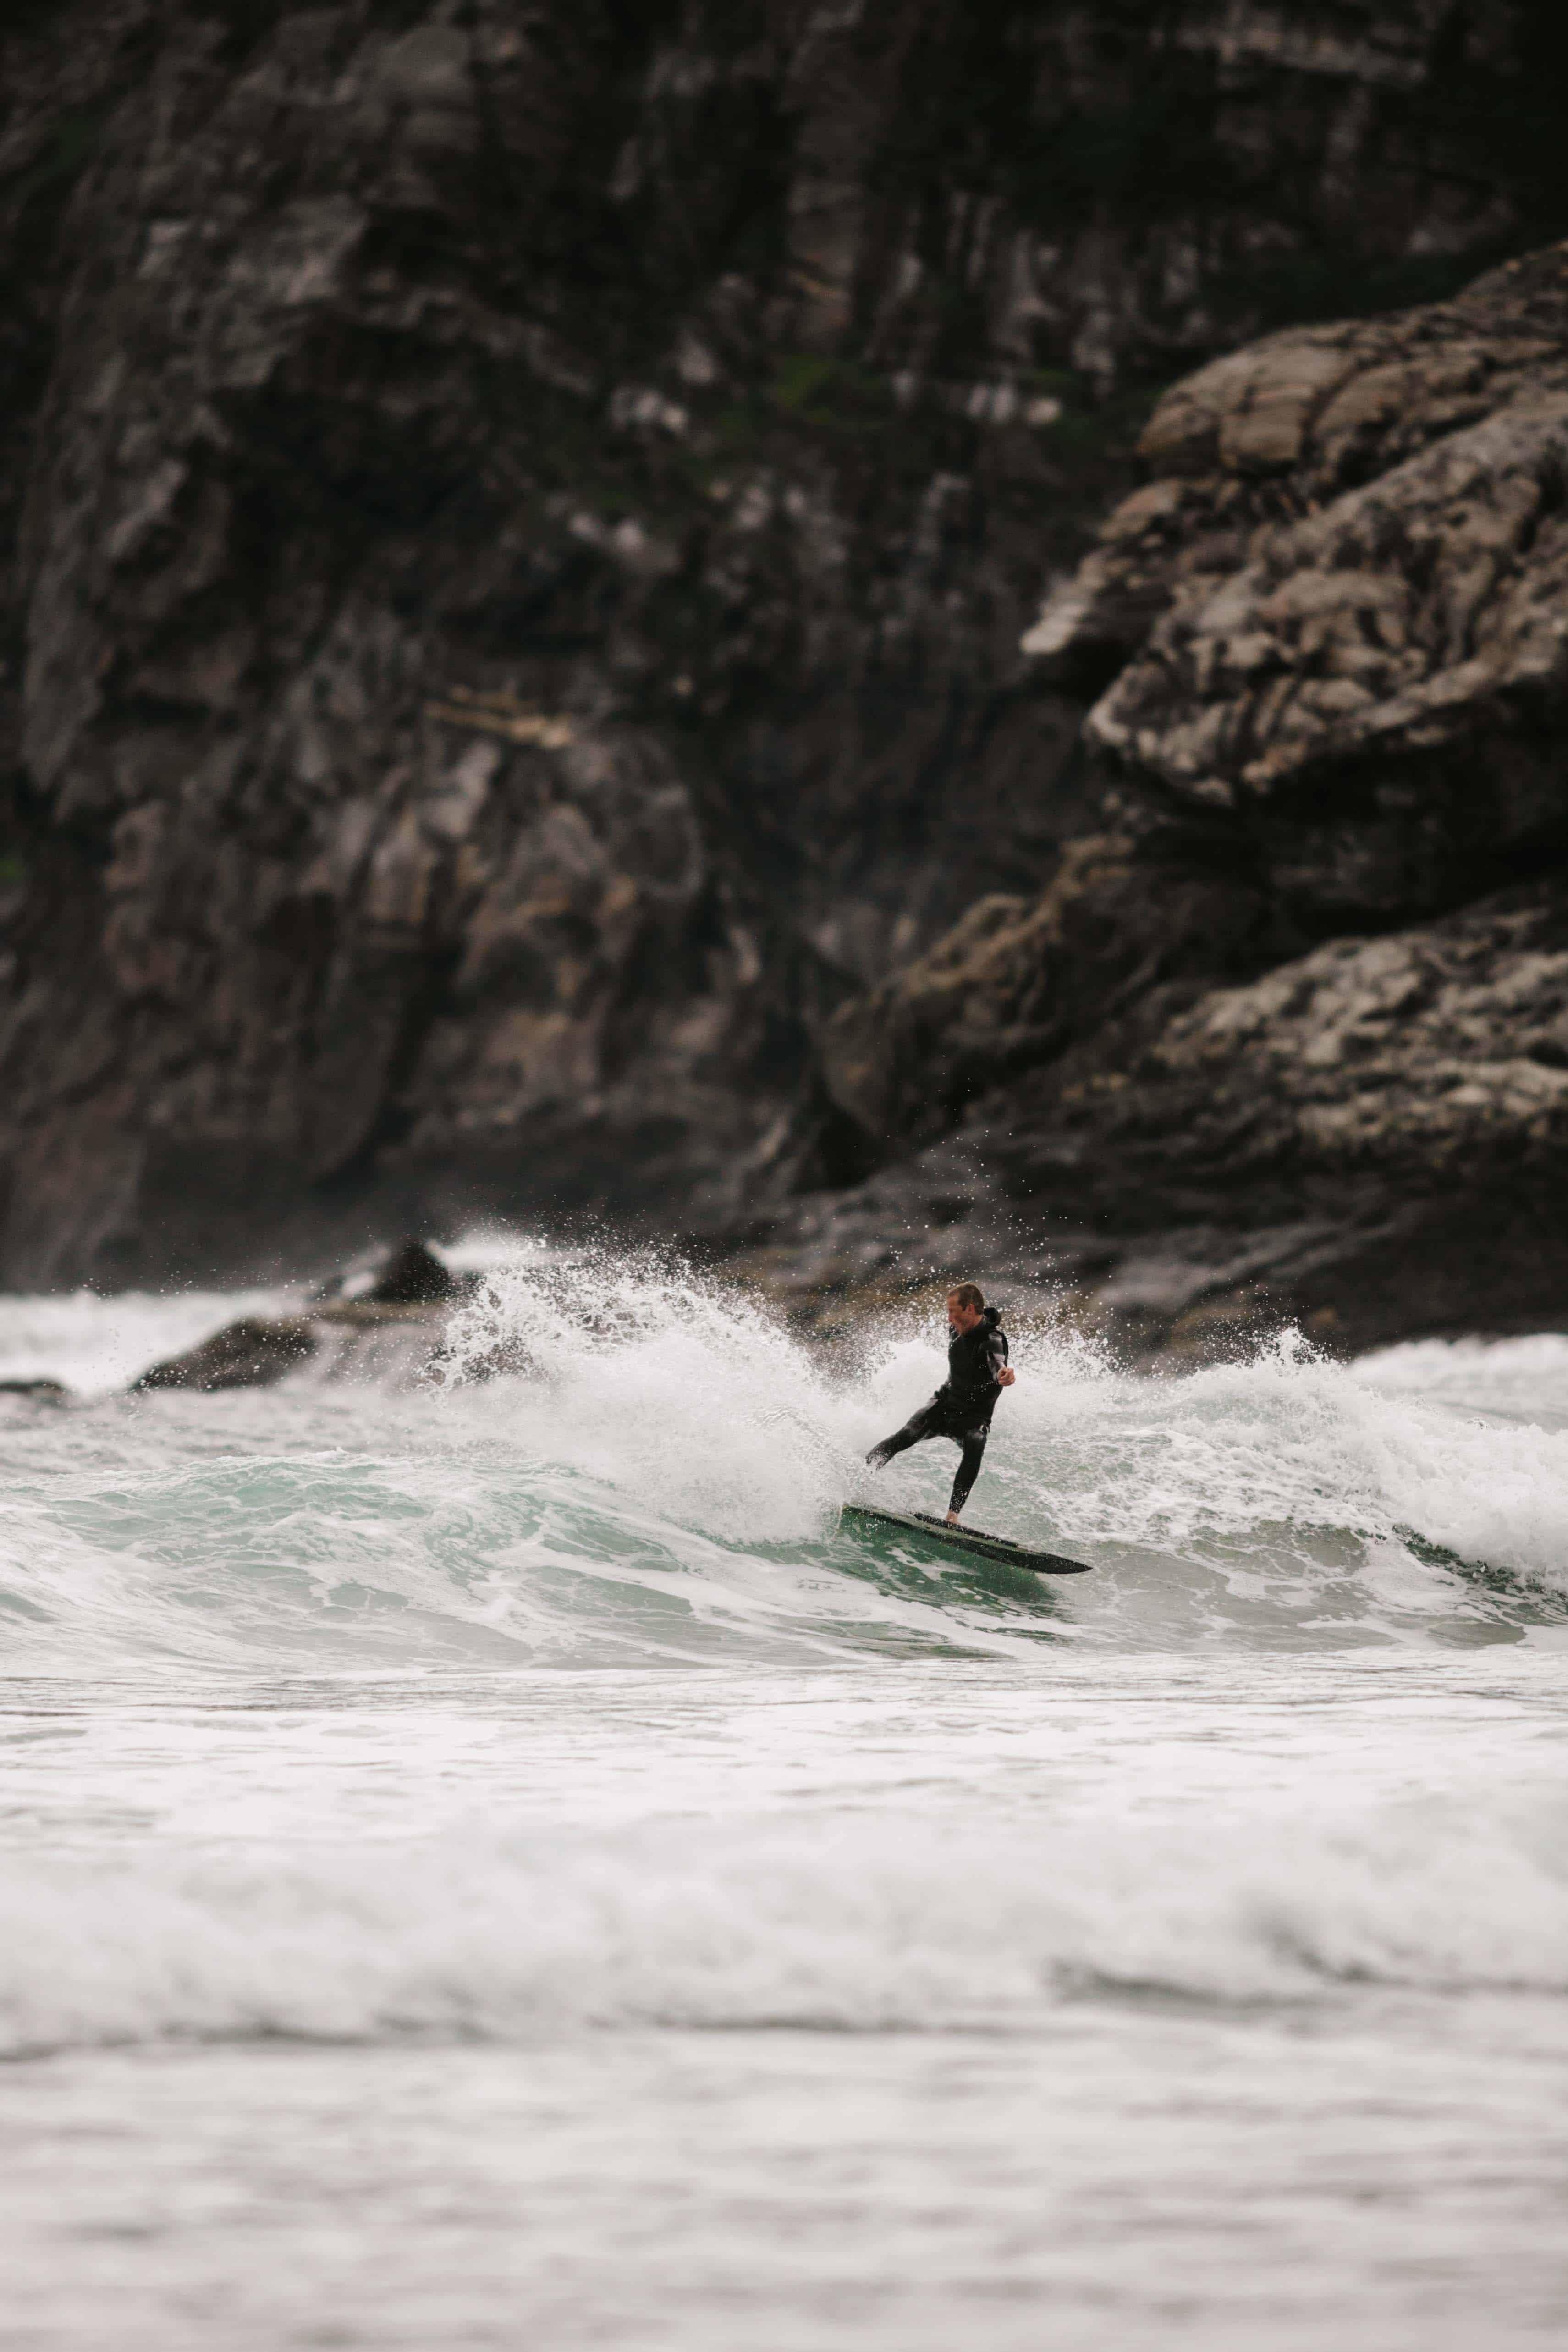 Ervik surfshop's nye eier. Foto: Saltnwax